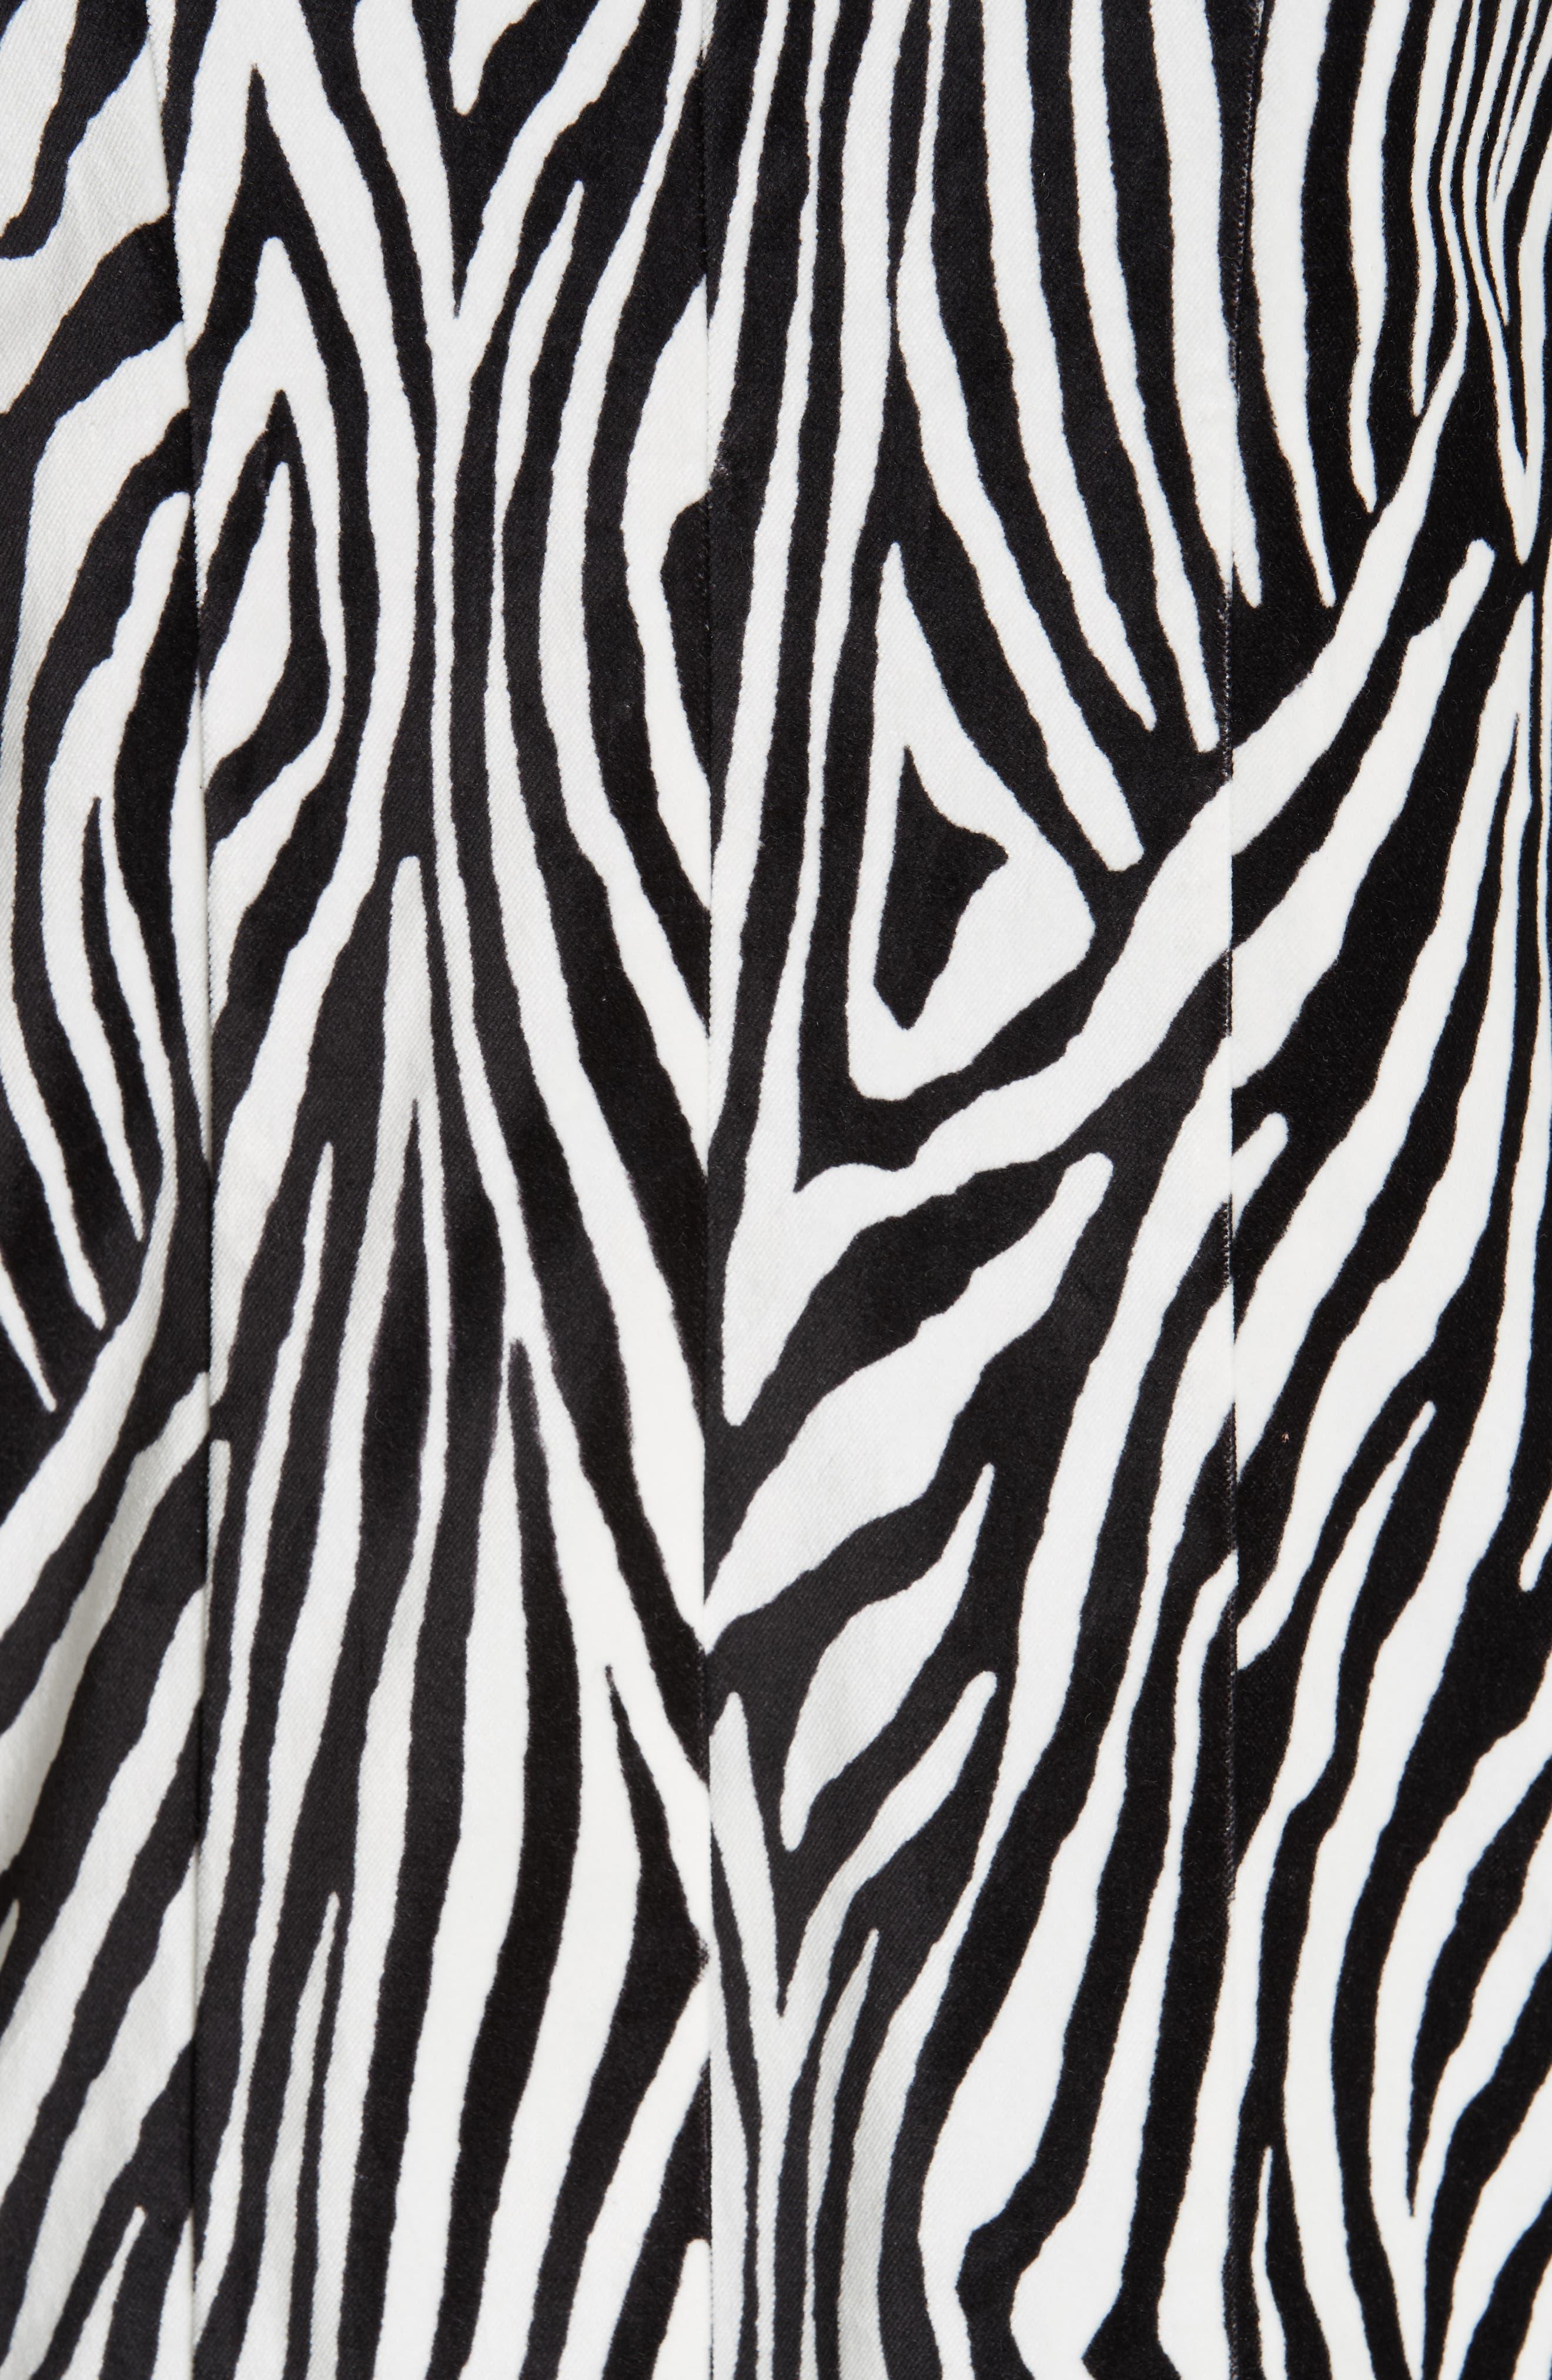 Zebra Print Blazer,                             Alternate thumbnail 6, color,                             NOIR MULTI